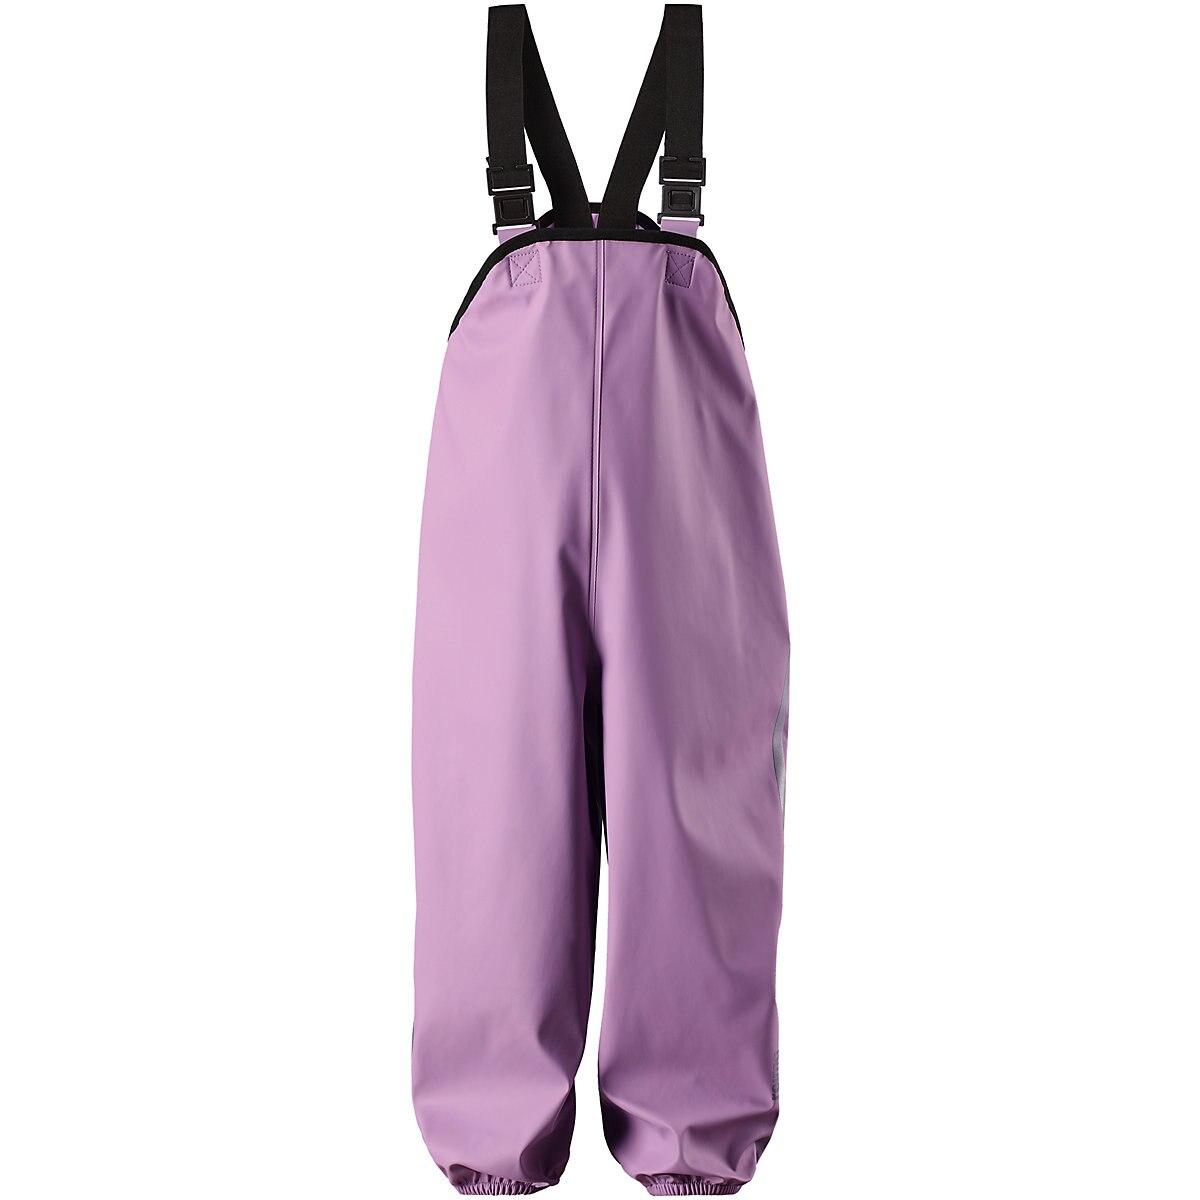 Pants & Capris Reima 8689634 for girls polyester autumn winter bomhcs cute women autumn winter 100